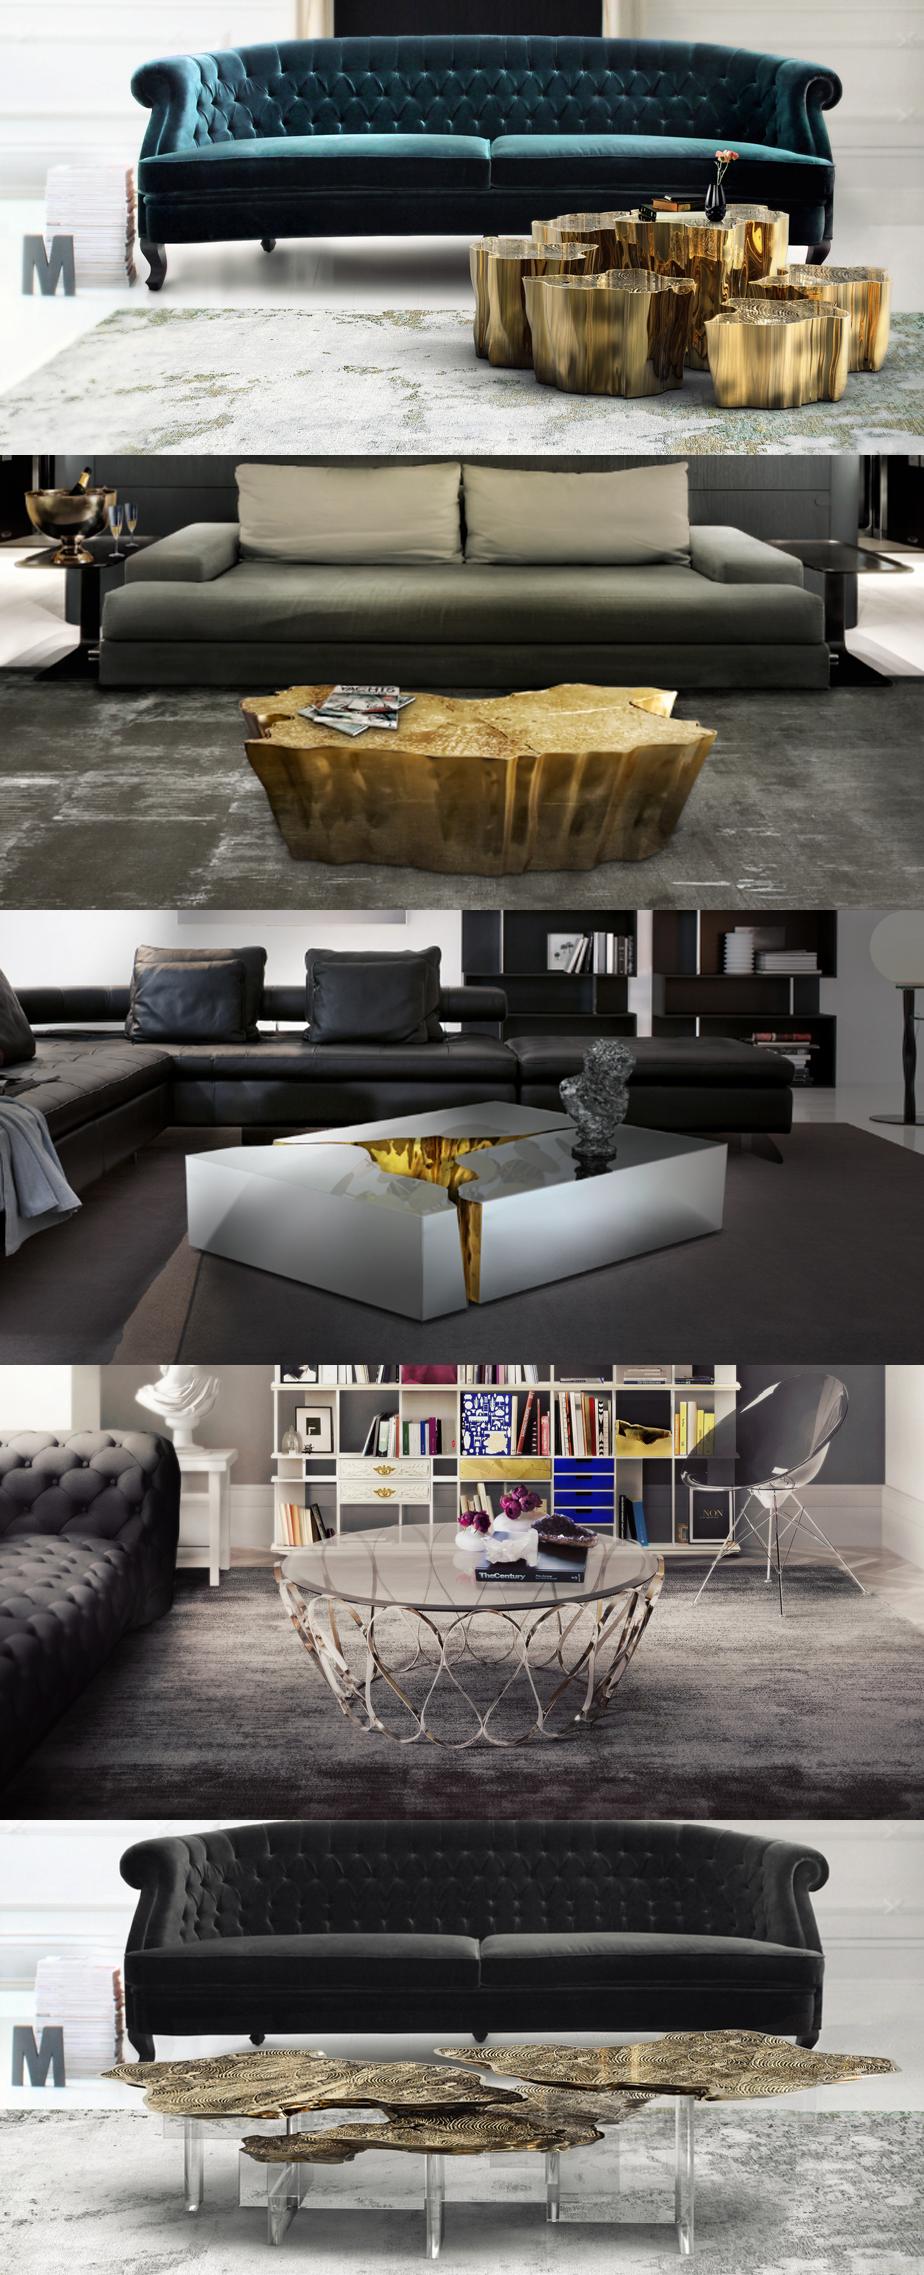 Top 5 Coffee Tables Brass Mirror Metal Center Tables Www Bocadolobo Com Livingroomideas Interiordesign Homede Arredamento Idee Per La Casa Tavolini Bassi